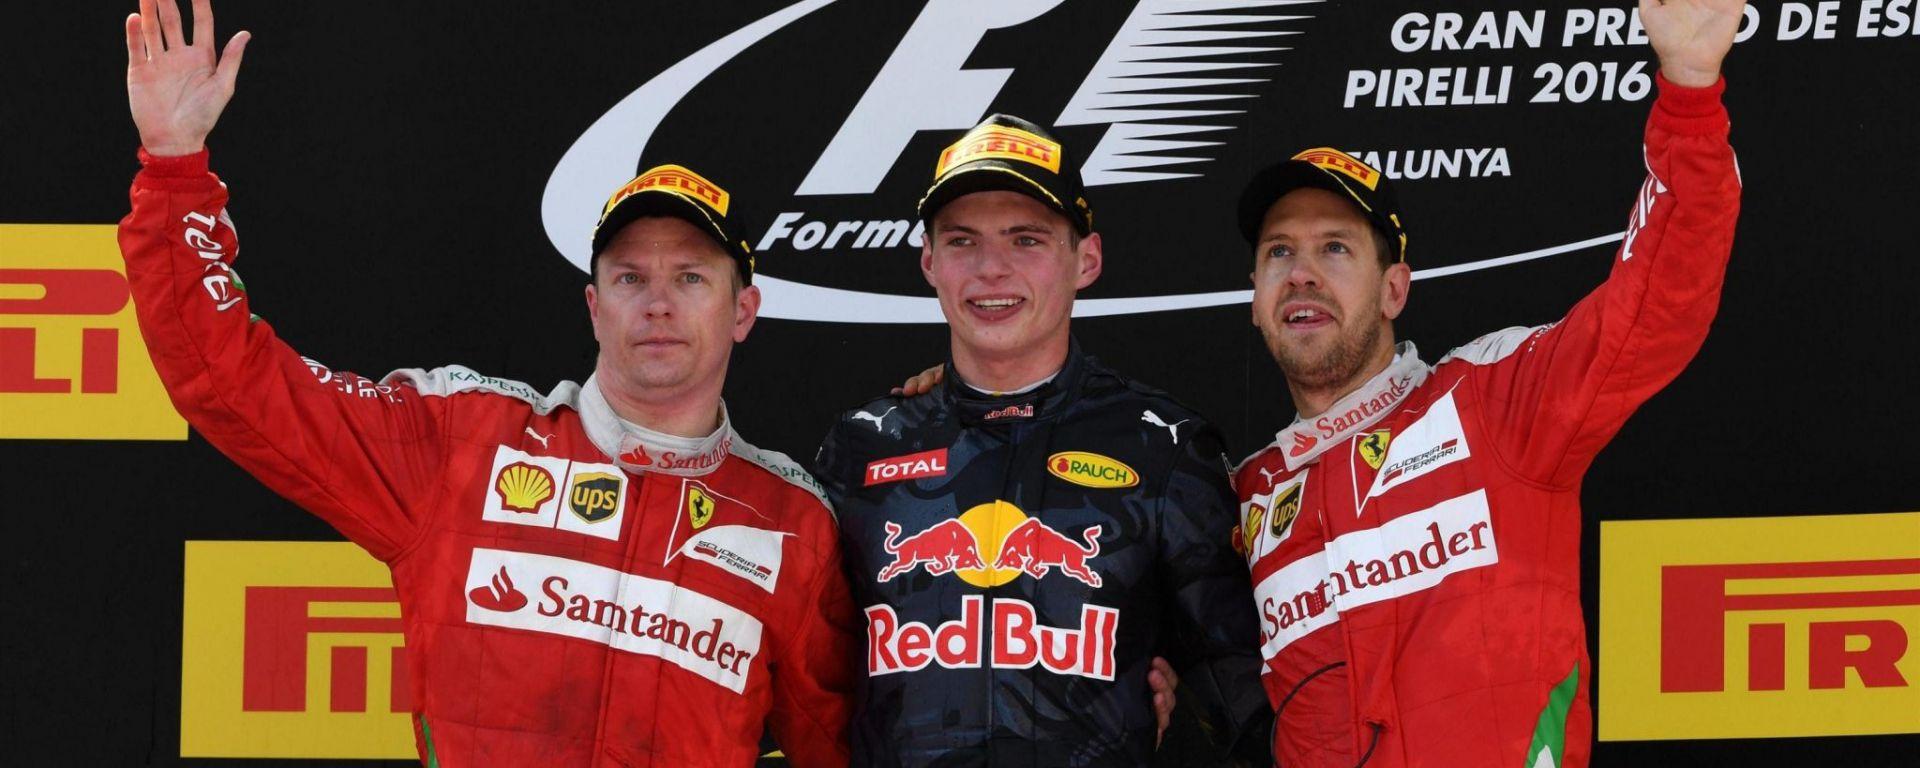 F1 2016 GP Spagna: le pagelle